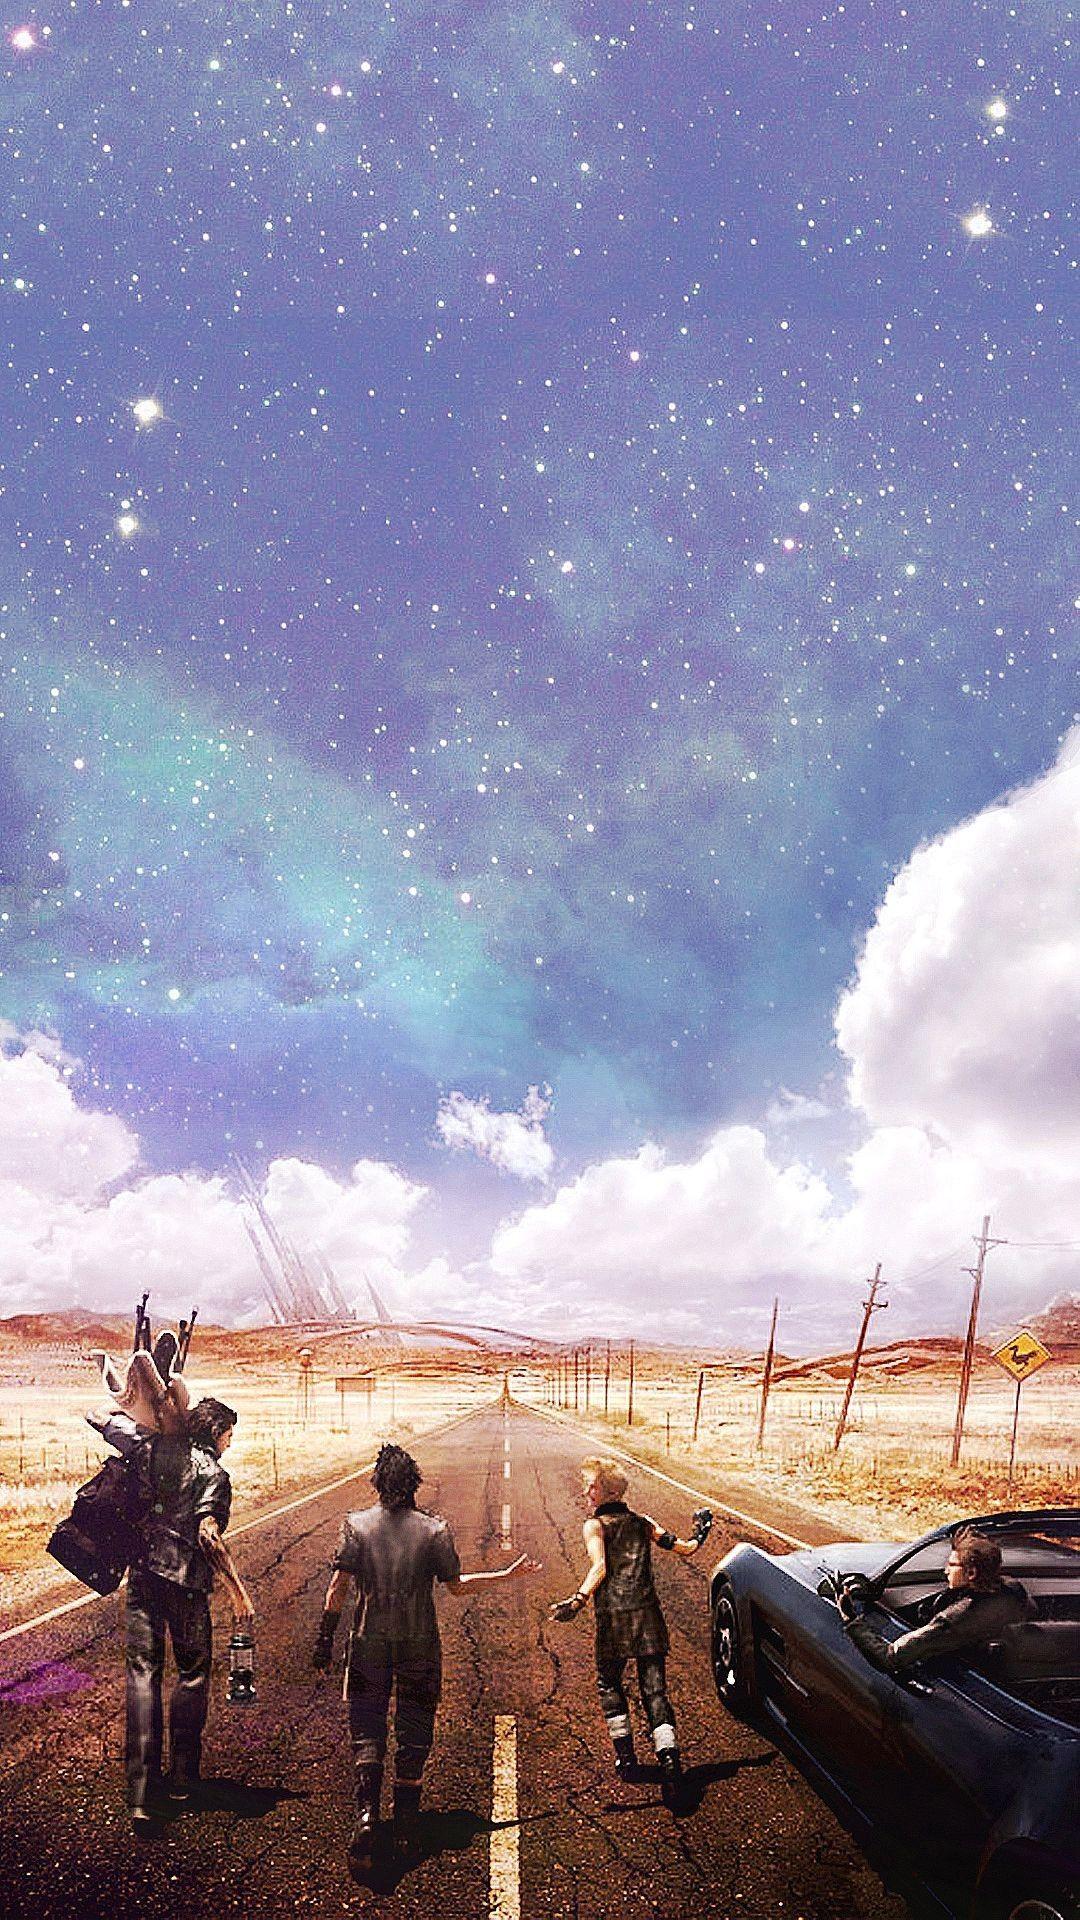 Ffxv Phone Wallpaper Final Fantasy Xv Wallpapers Final Fantasy Art Final Fantasy